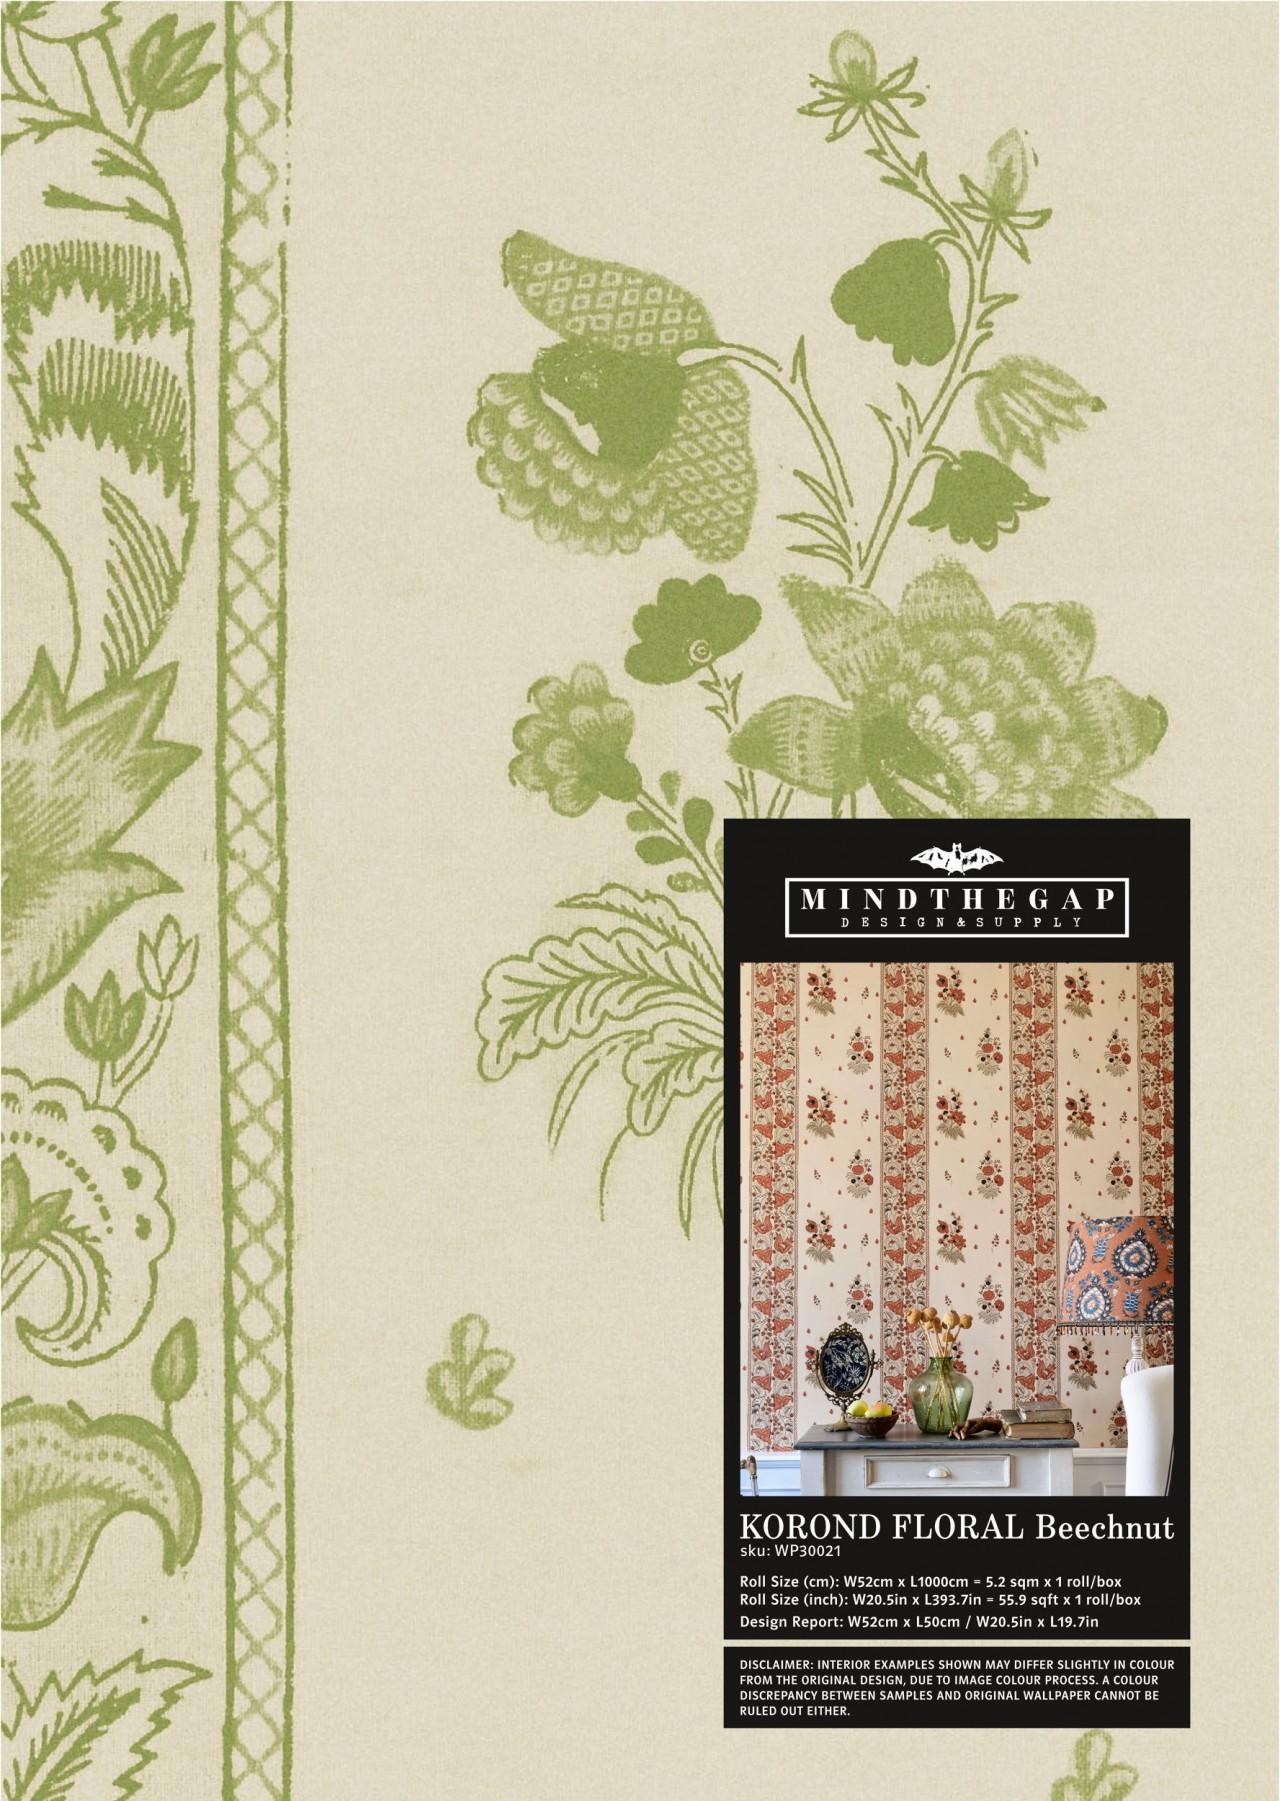 KOROND FLORAL Beechnut Wallpaper Sample